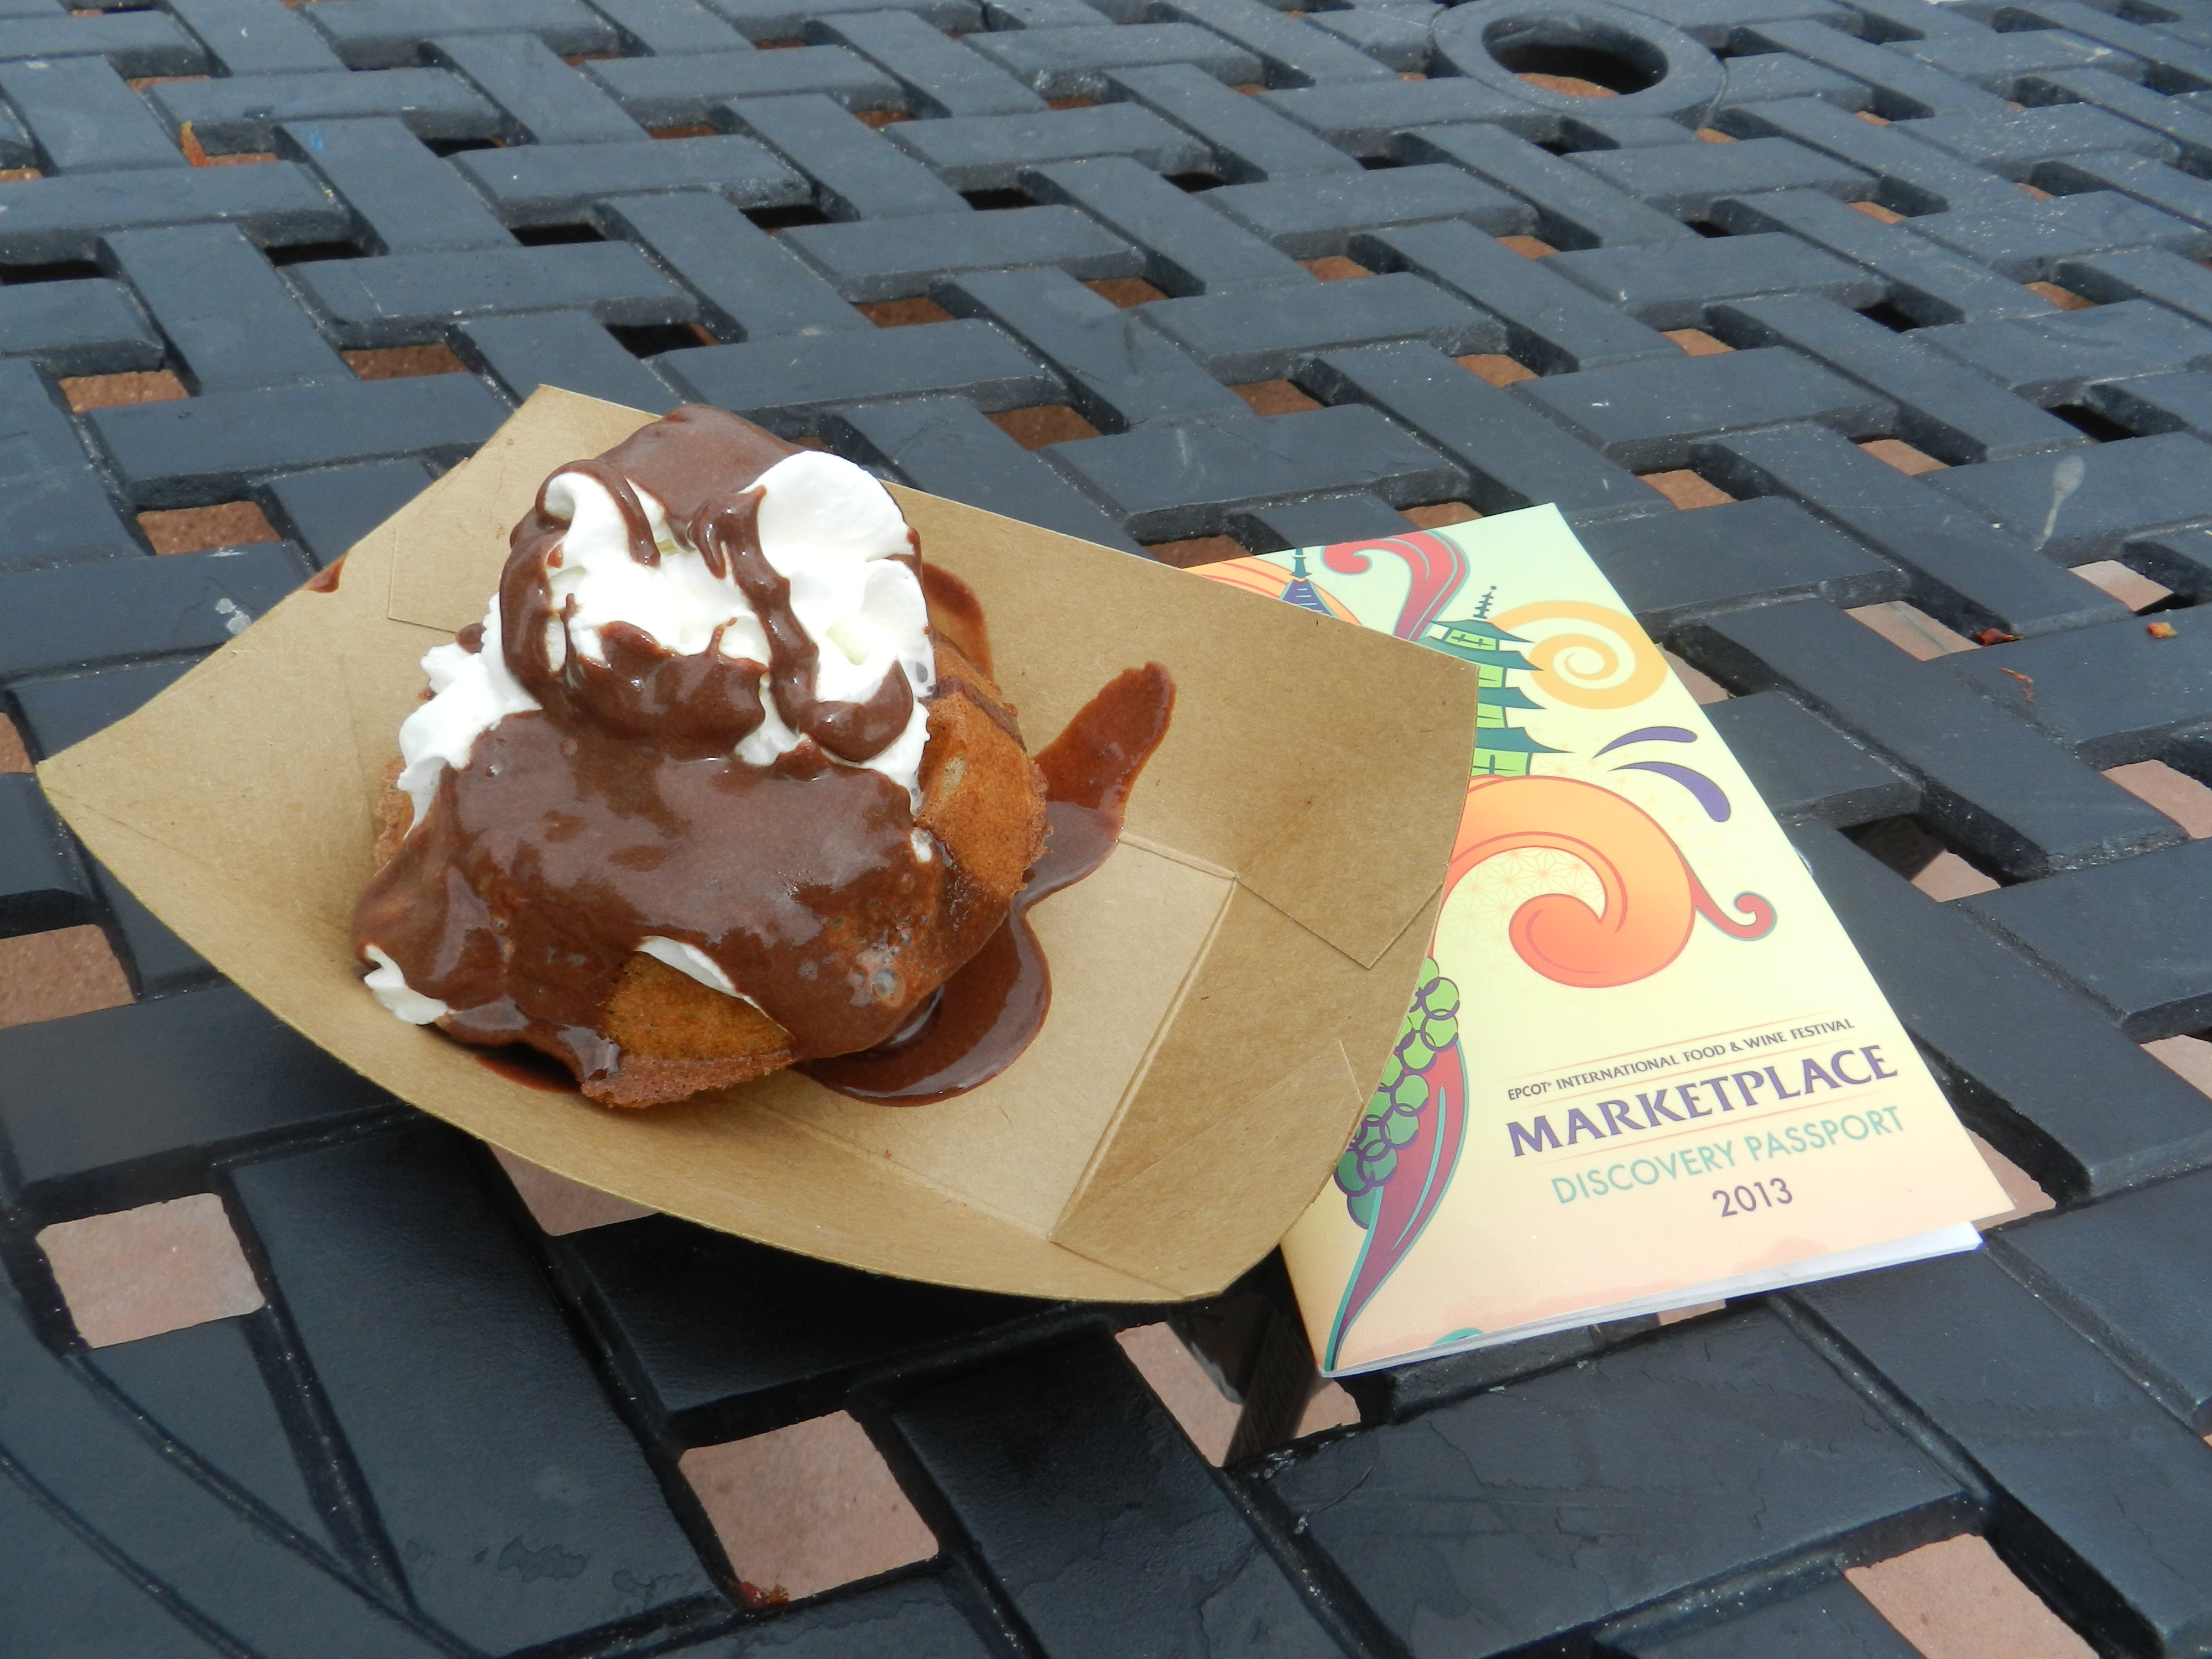 Belgium Marketplace: Belgian Waffle with Warm Chocolate Ganache & Whipped Cream